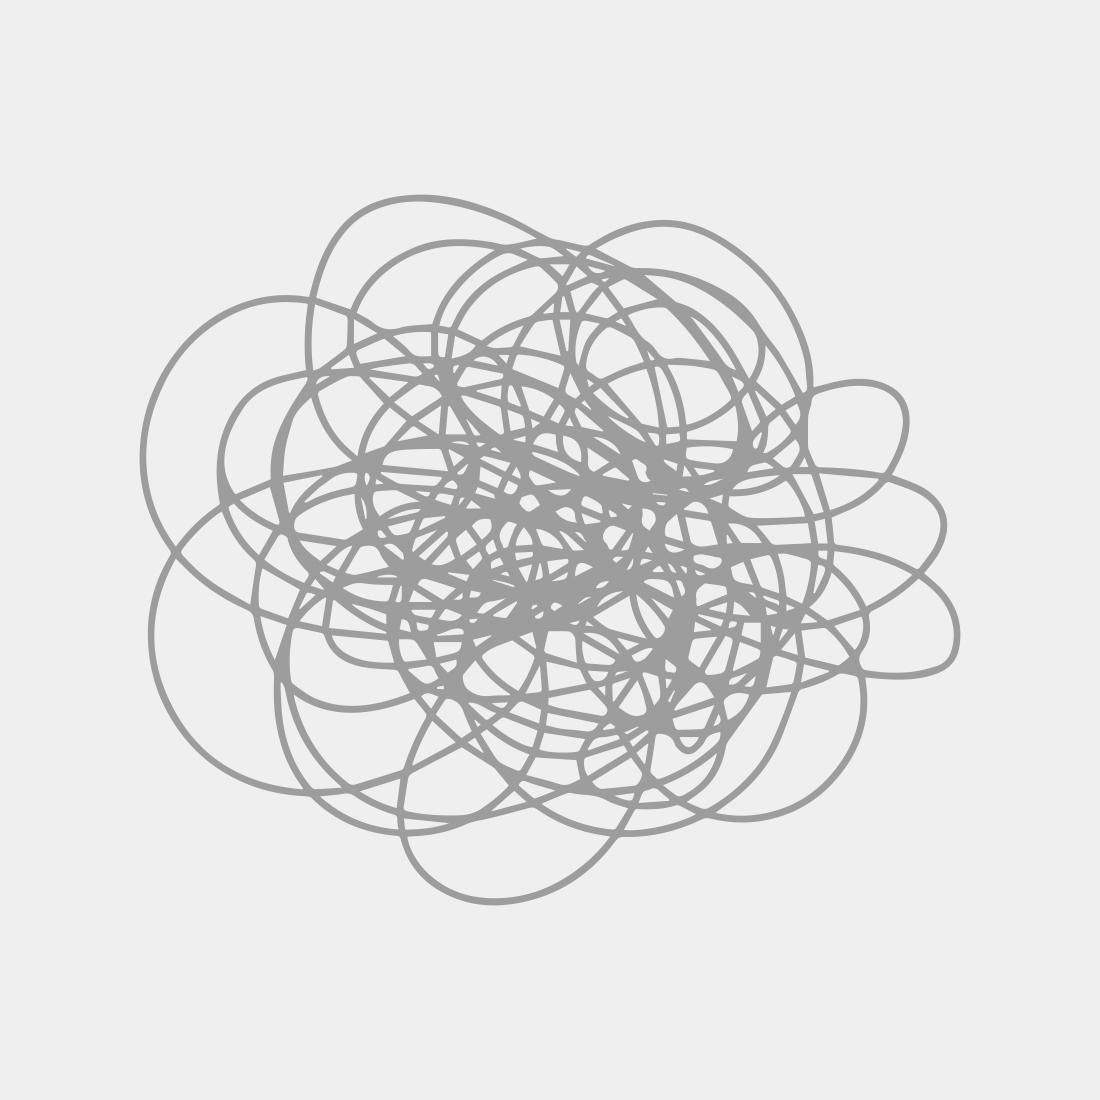 Galerie Louise Leiris, 45 Linoléums gravés, 1960